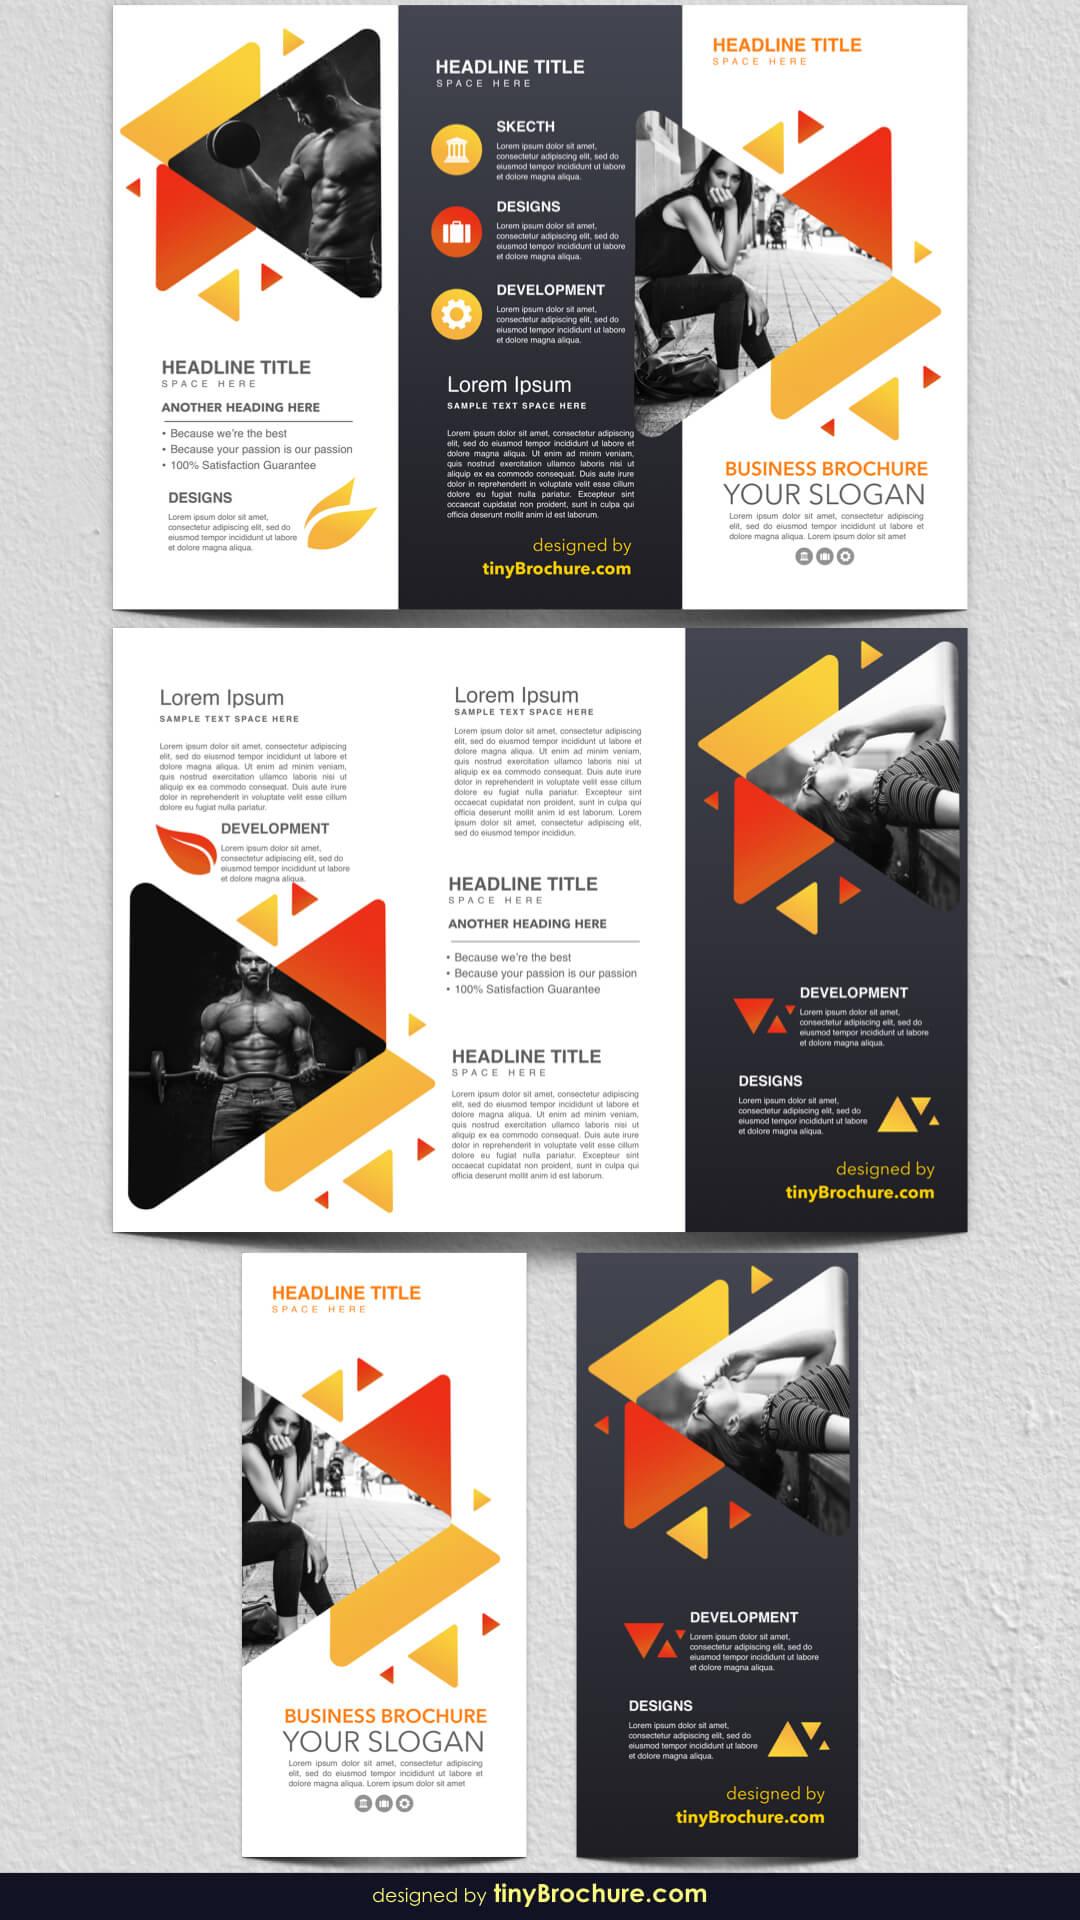 3 Panel Brochure Template Google Docs 2019 | Graphic Design Regarding Three Panel Brochure Template